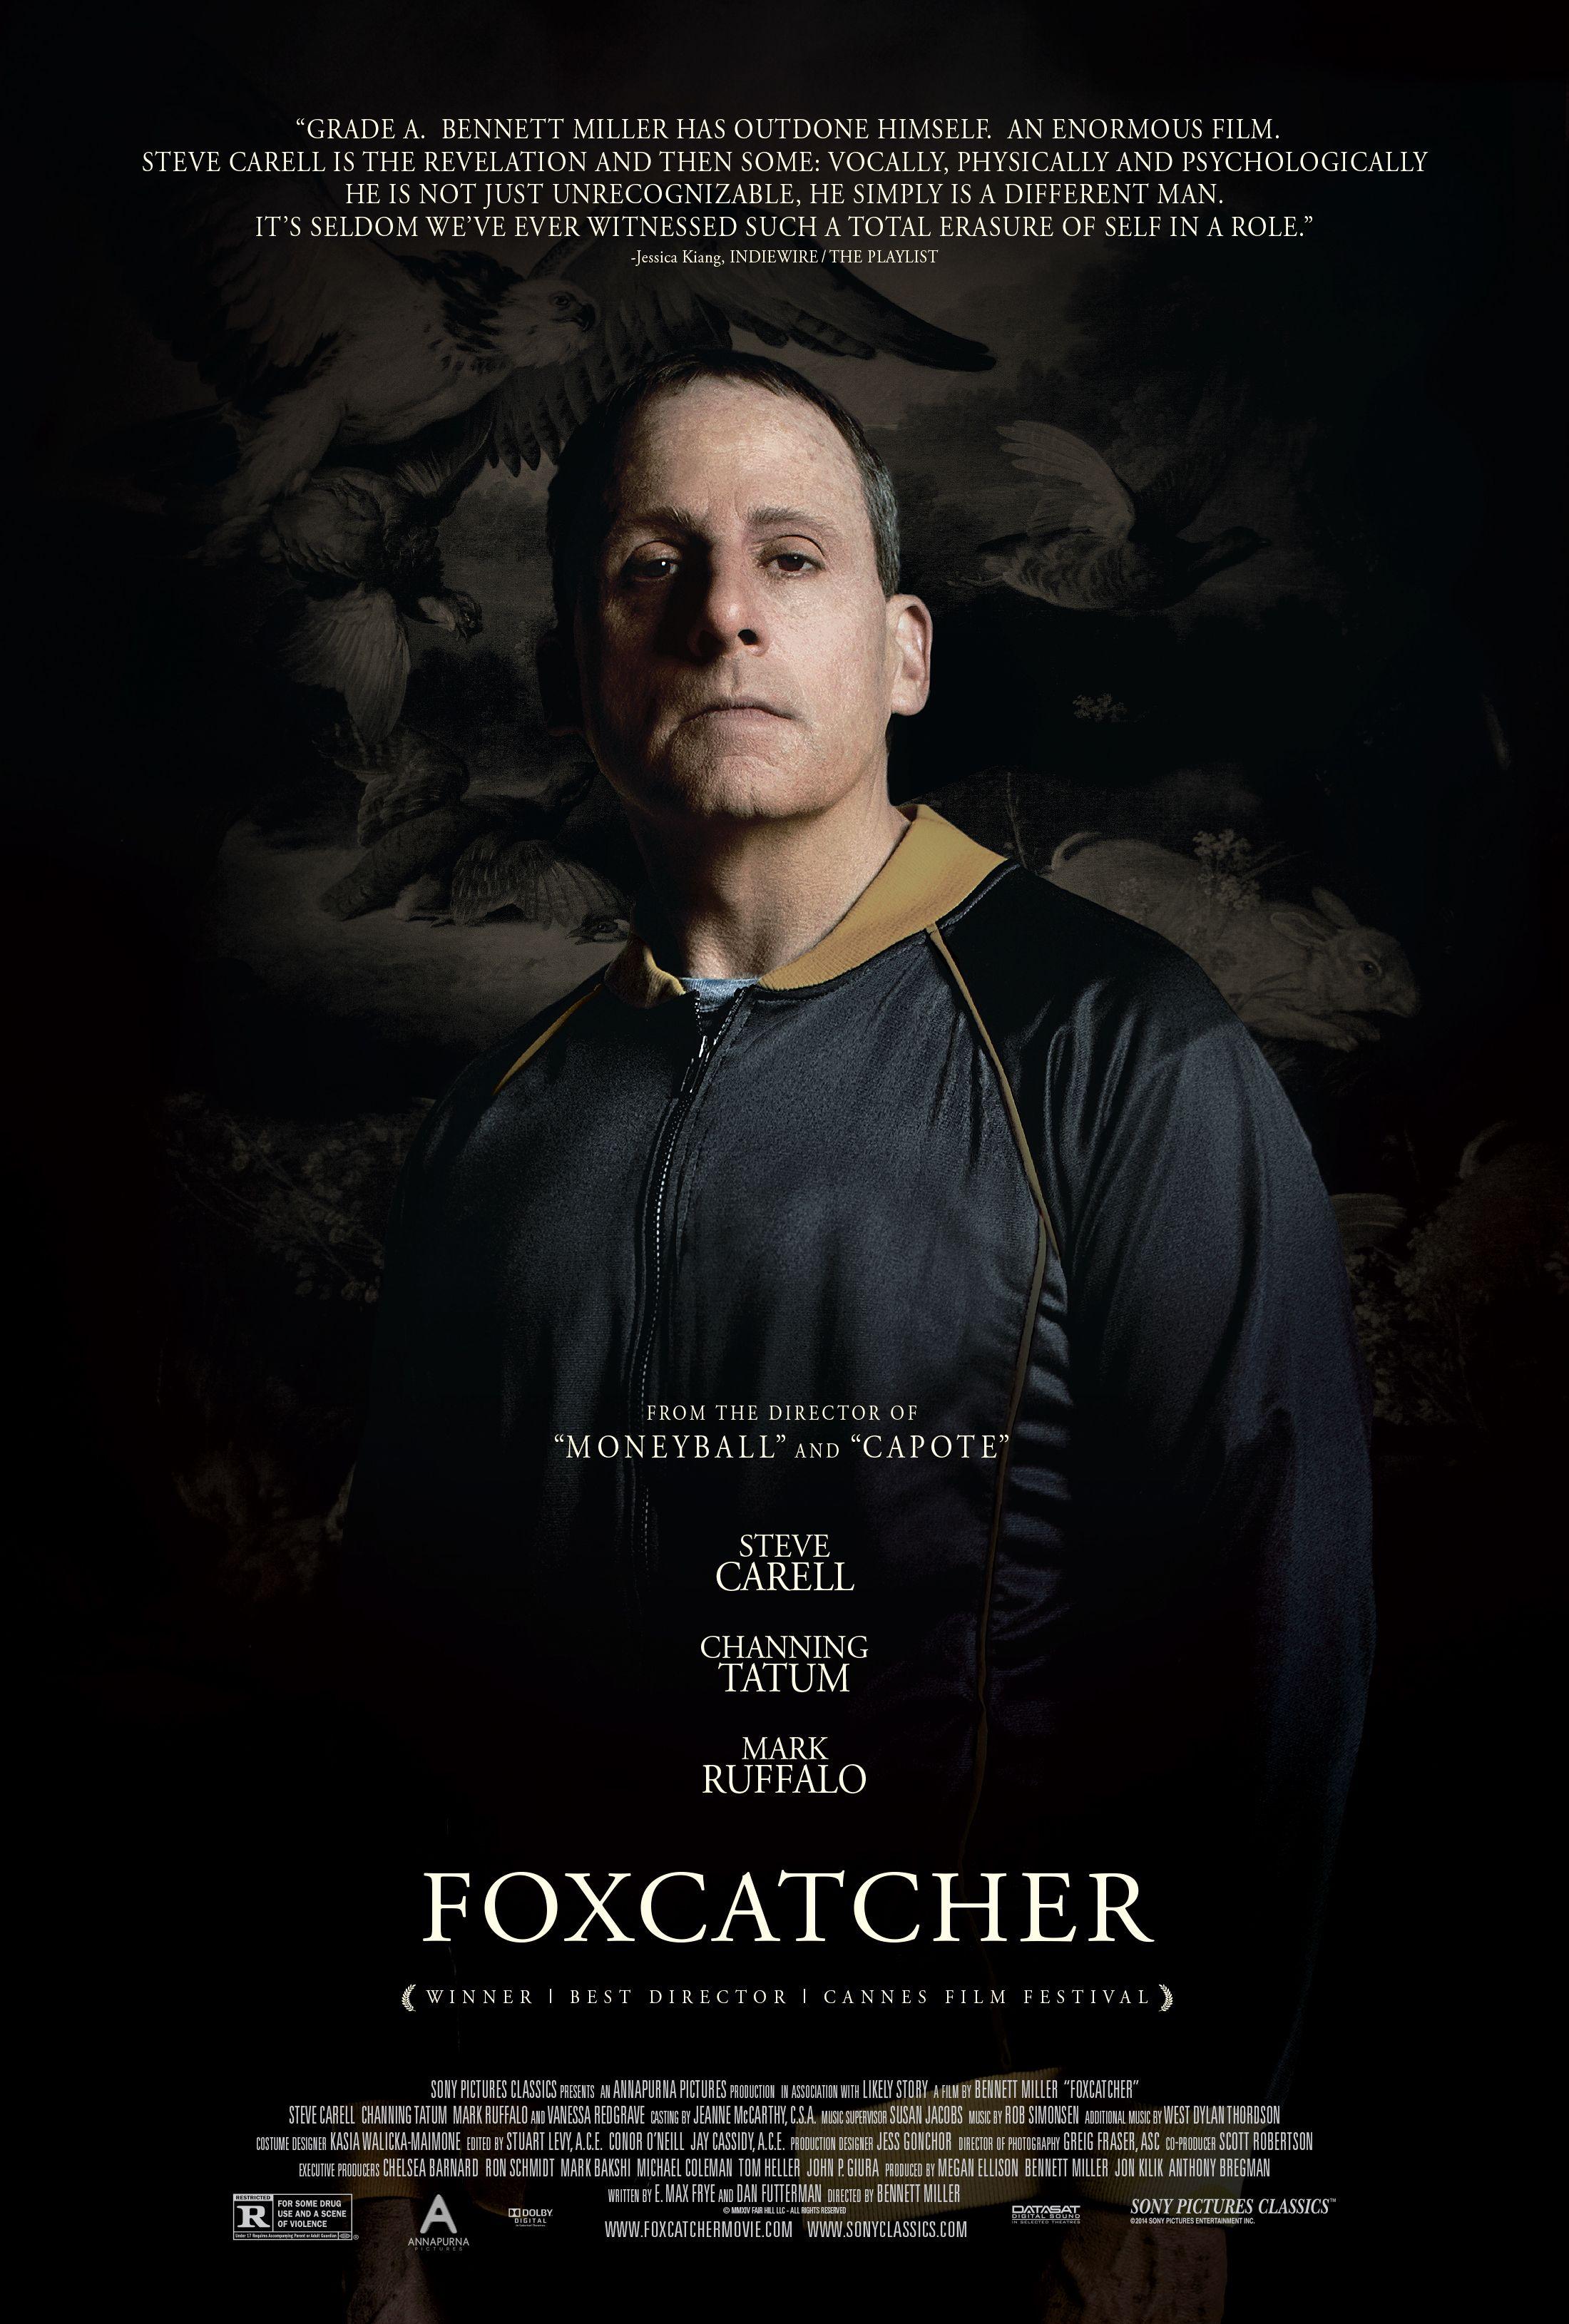 Steve Carell Foxcatcher Poster